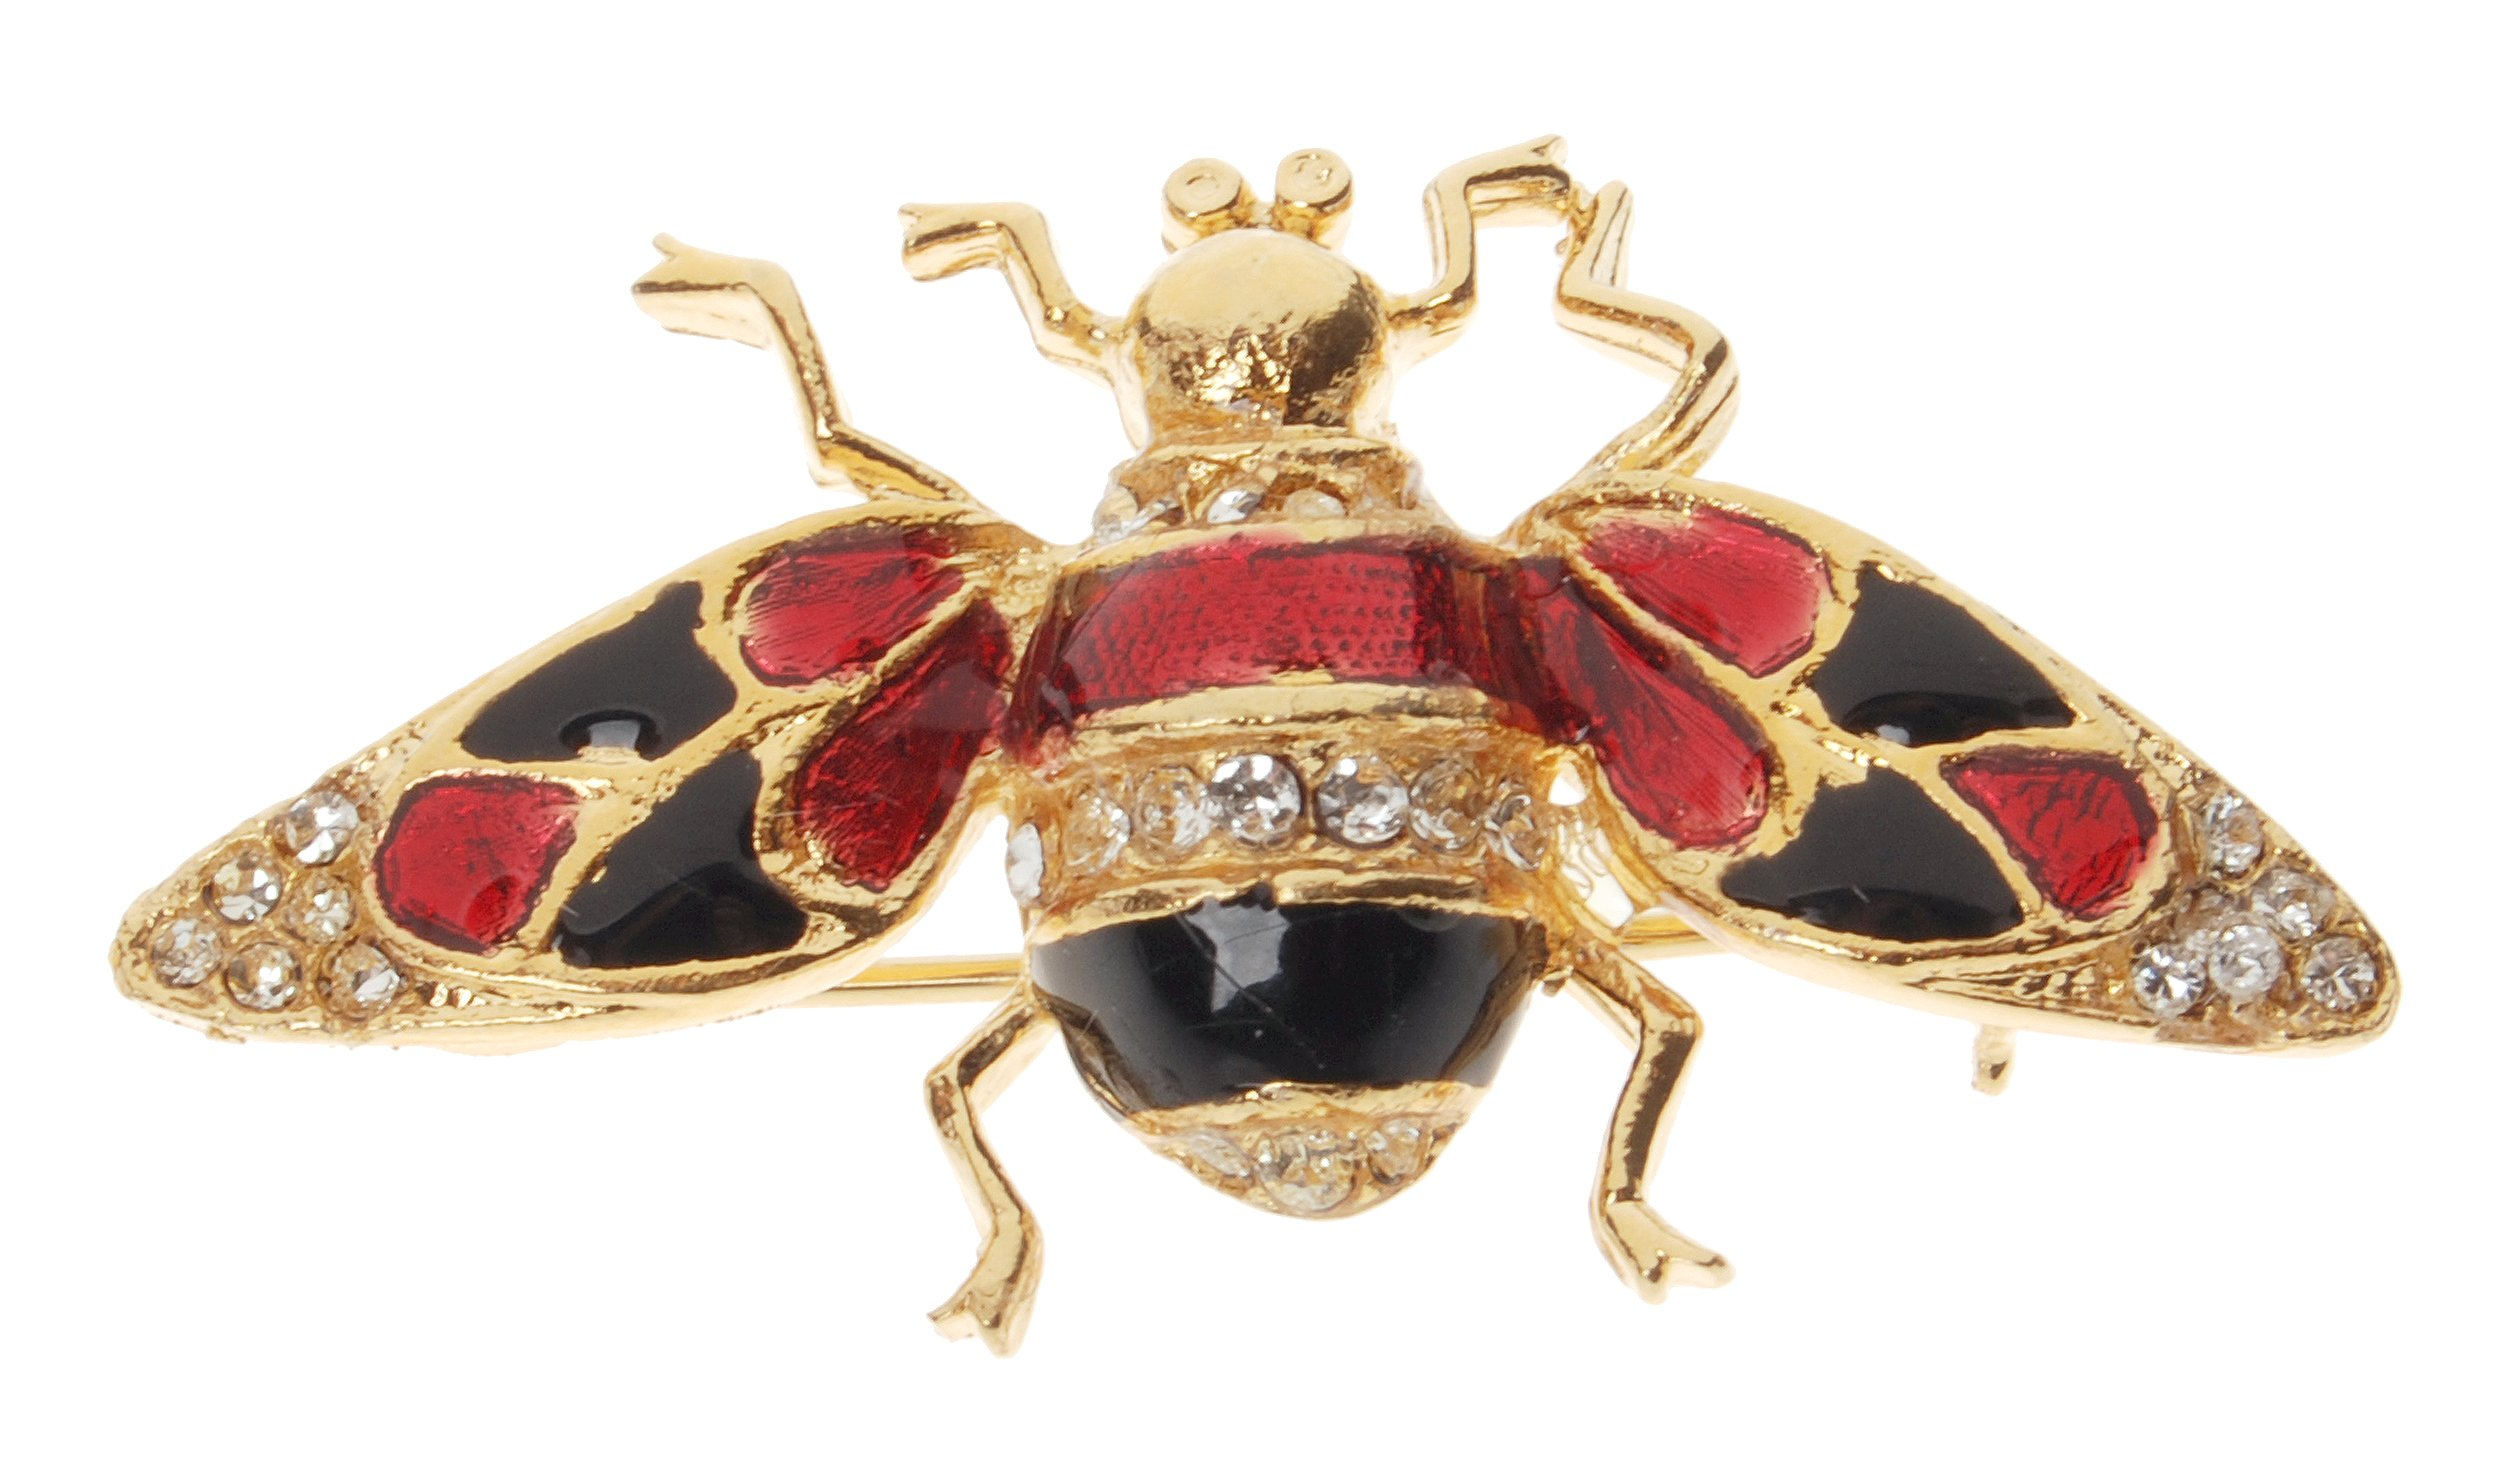 L. Erickson Buzzing Bee Enamel Brooch - Black/Red/Gold